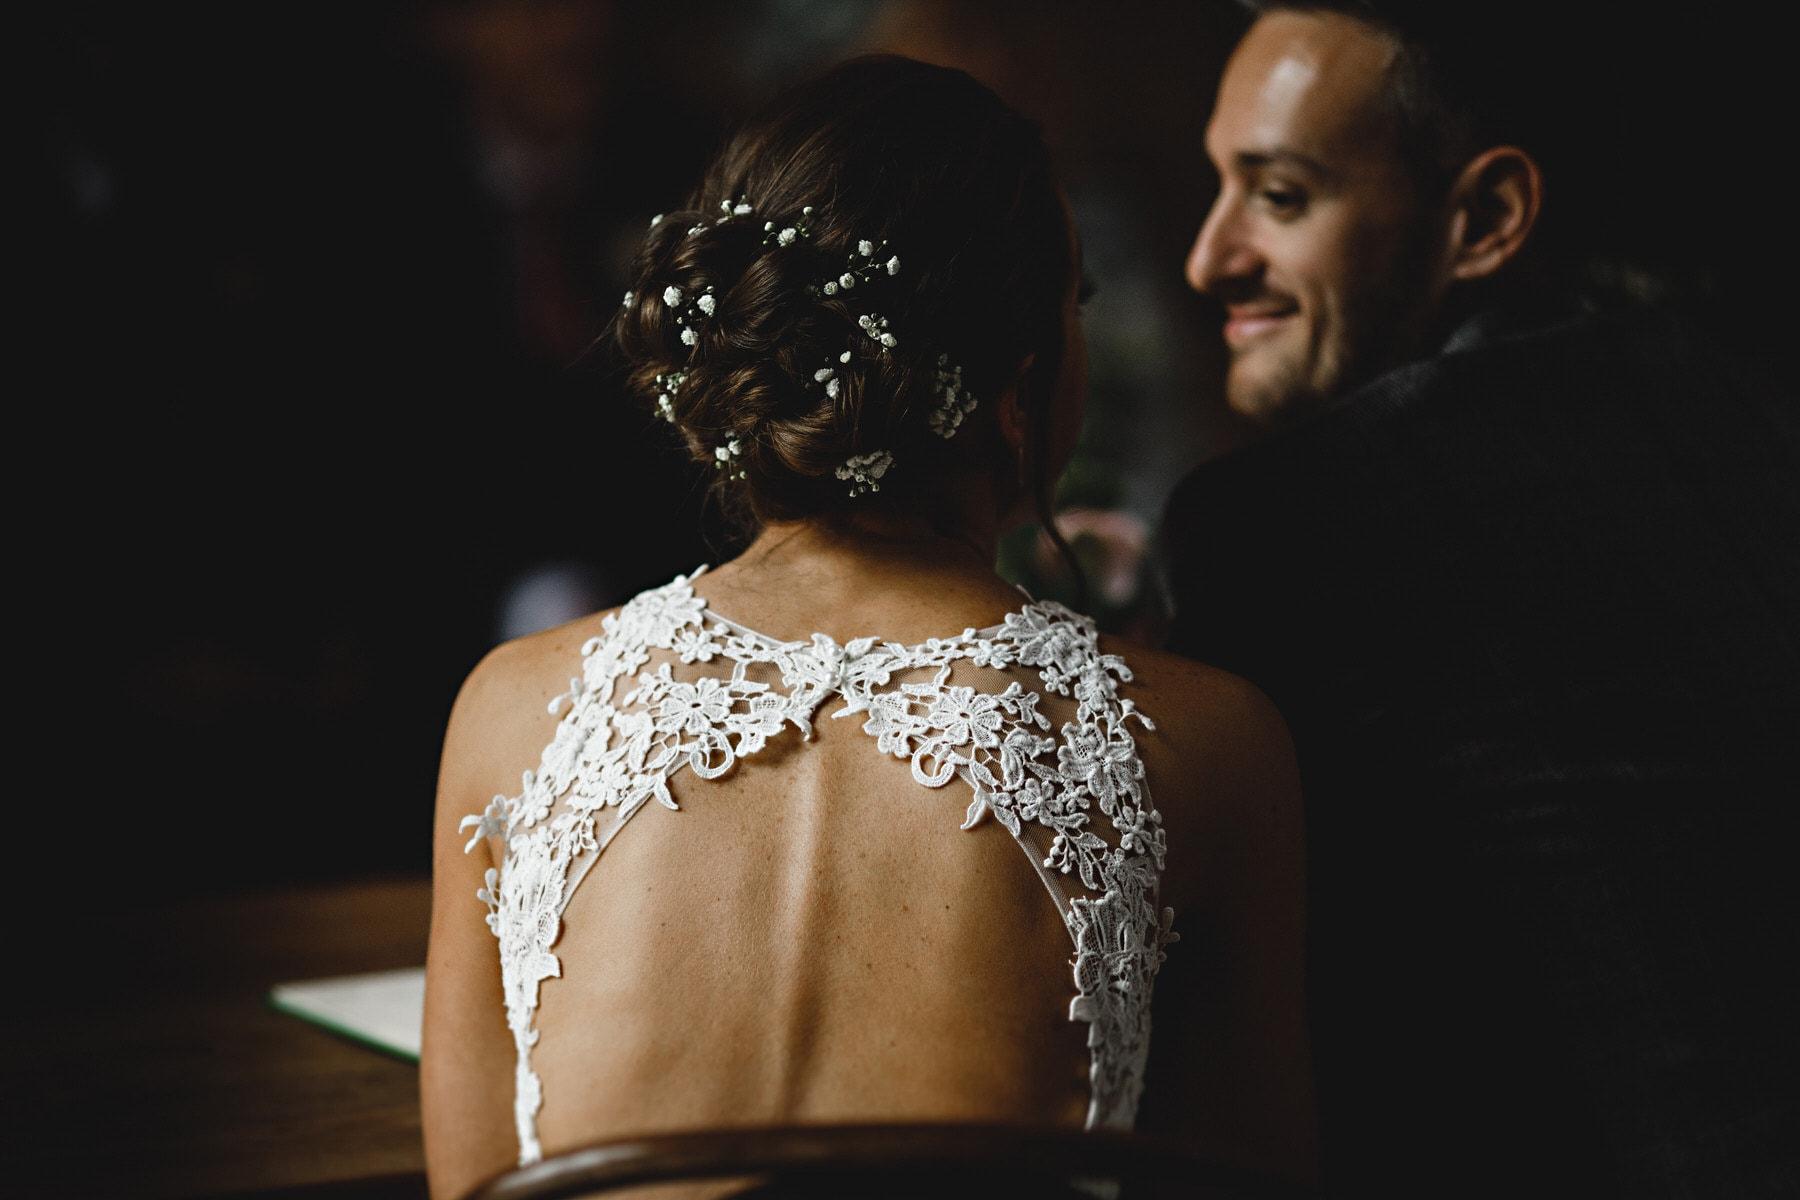 details of the brides dress